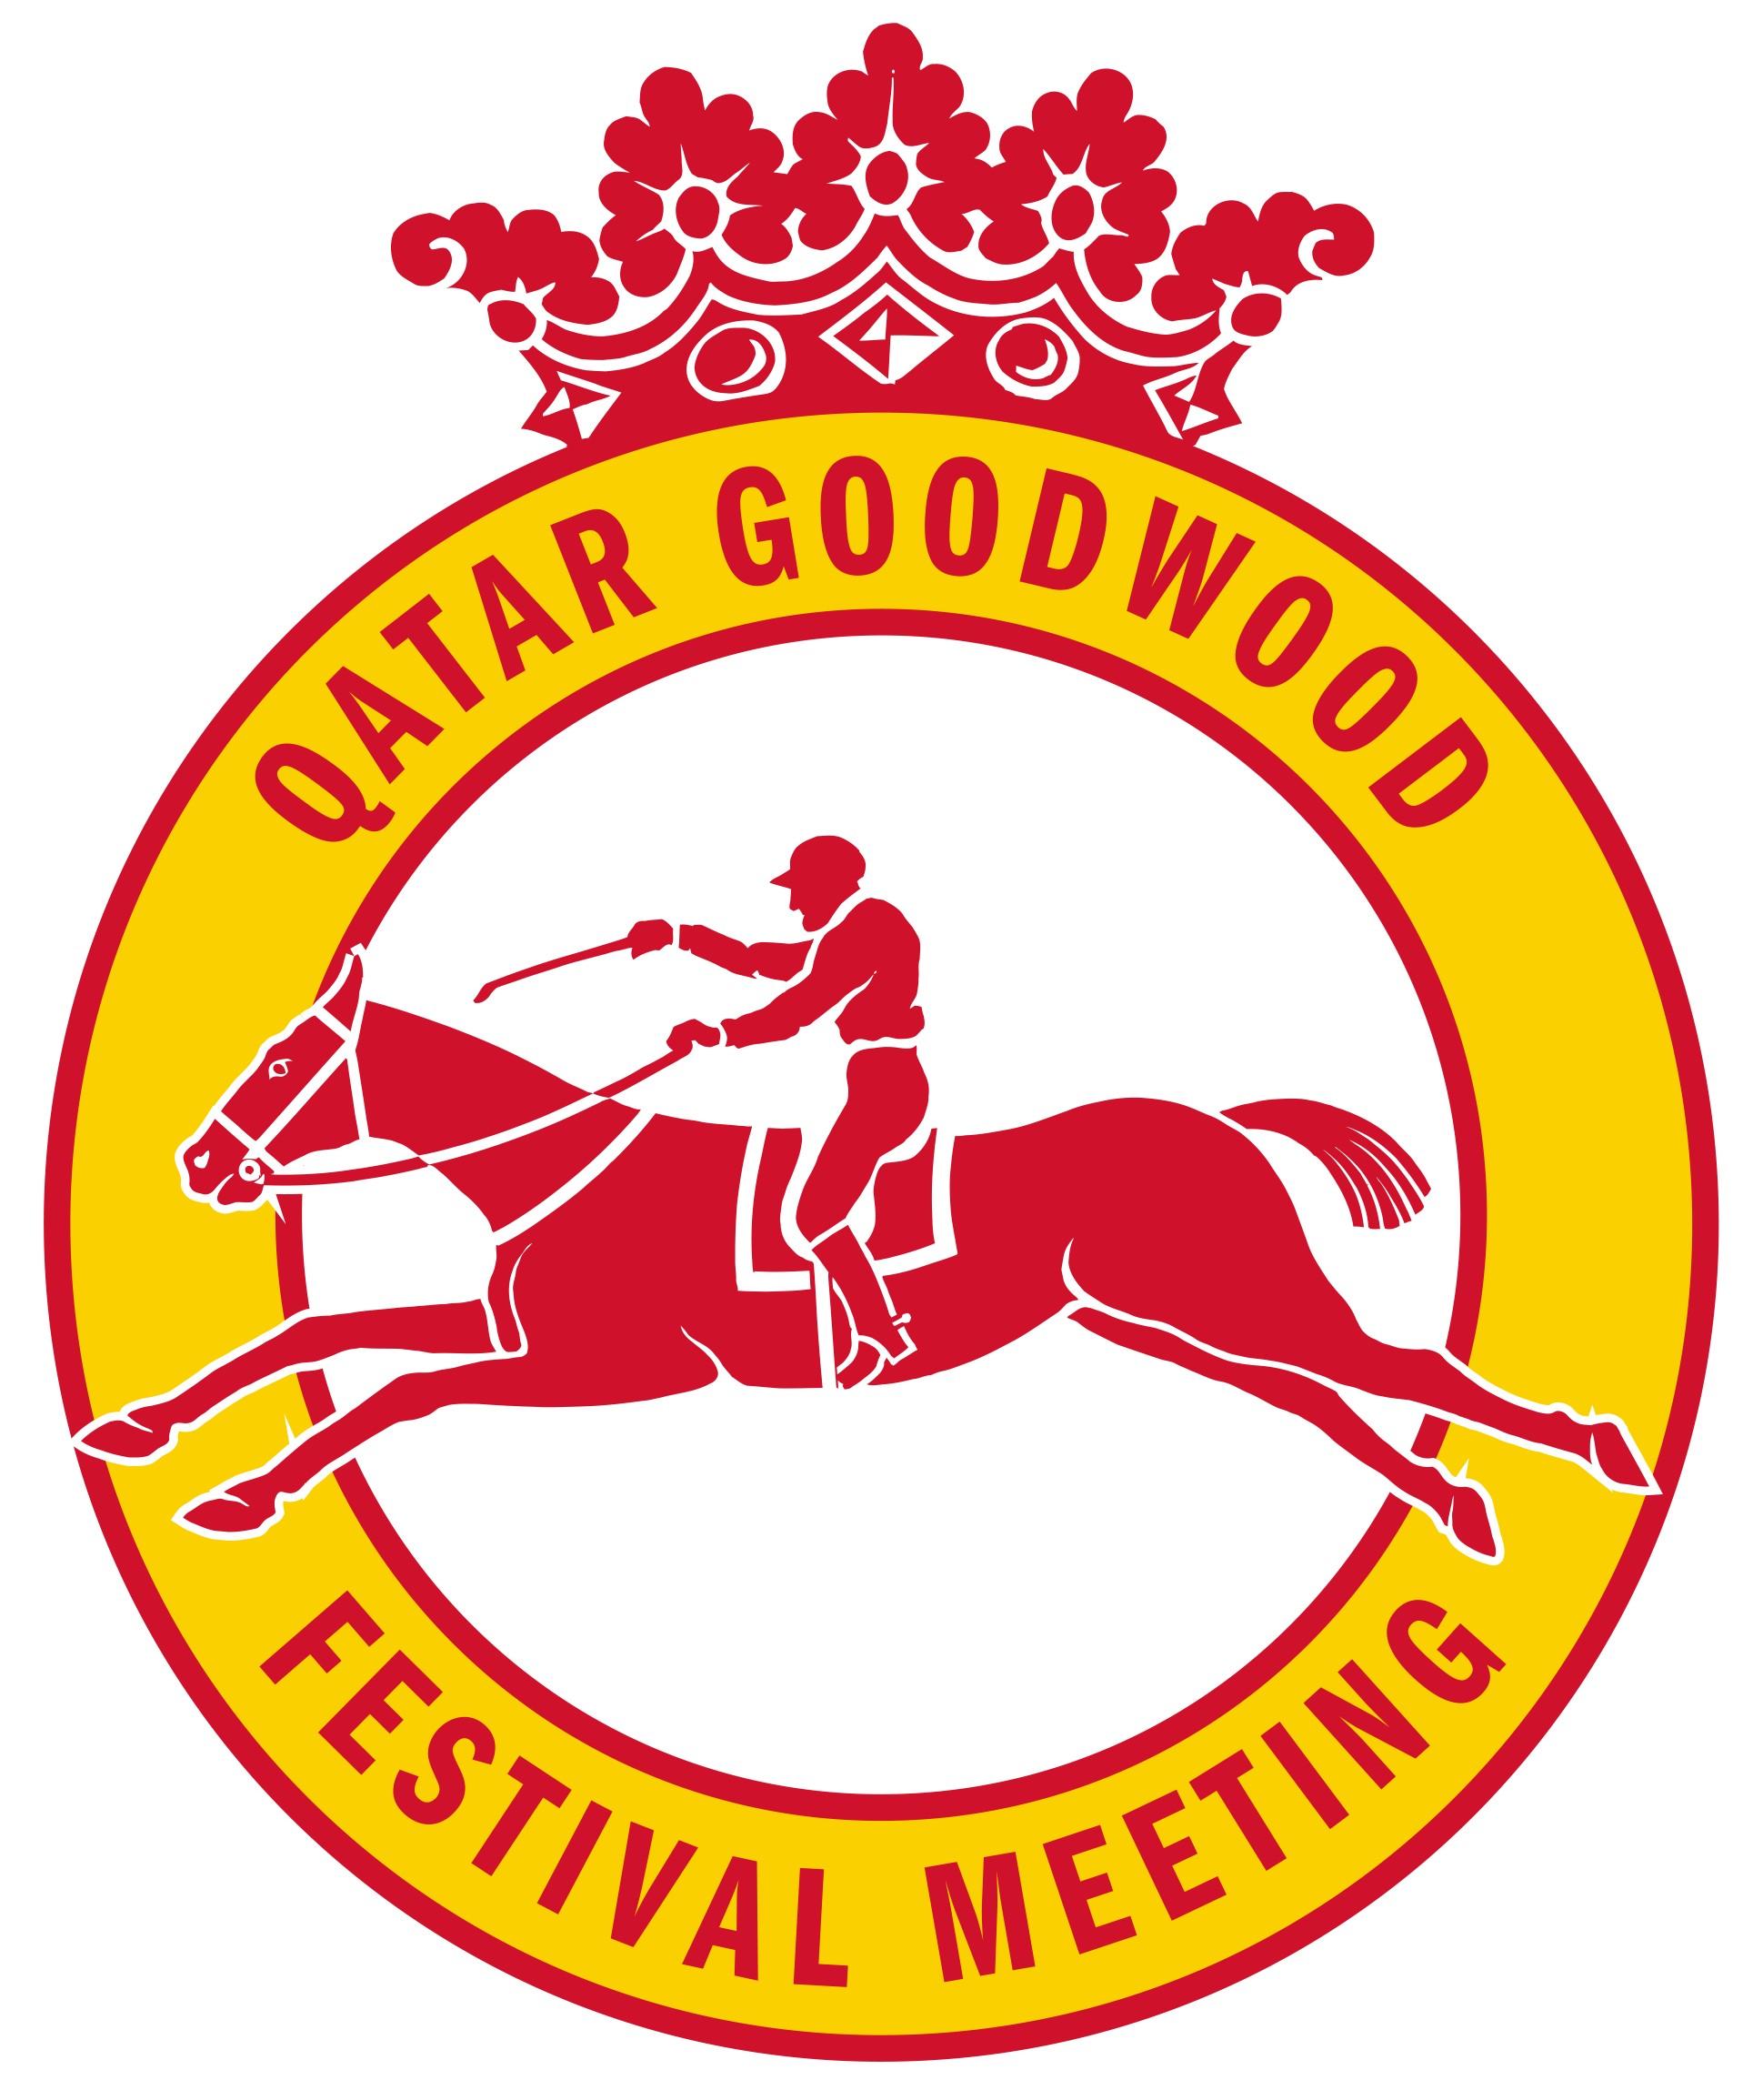 quatar goodwood coach VIP transfer